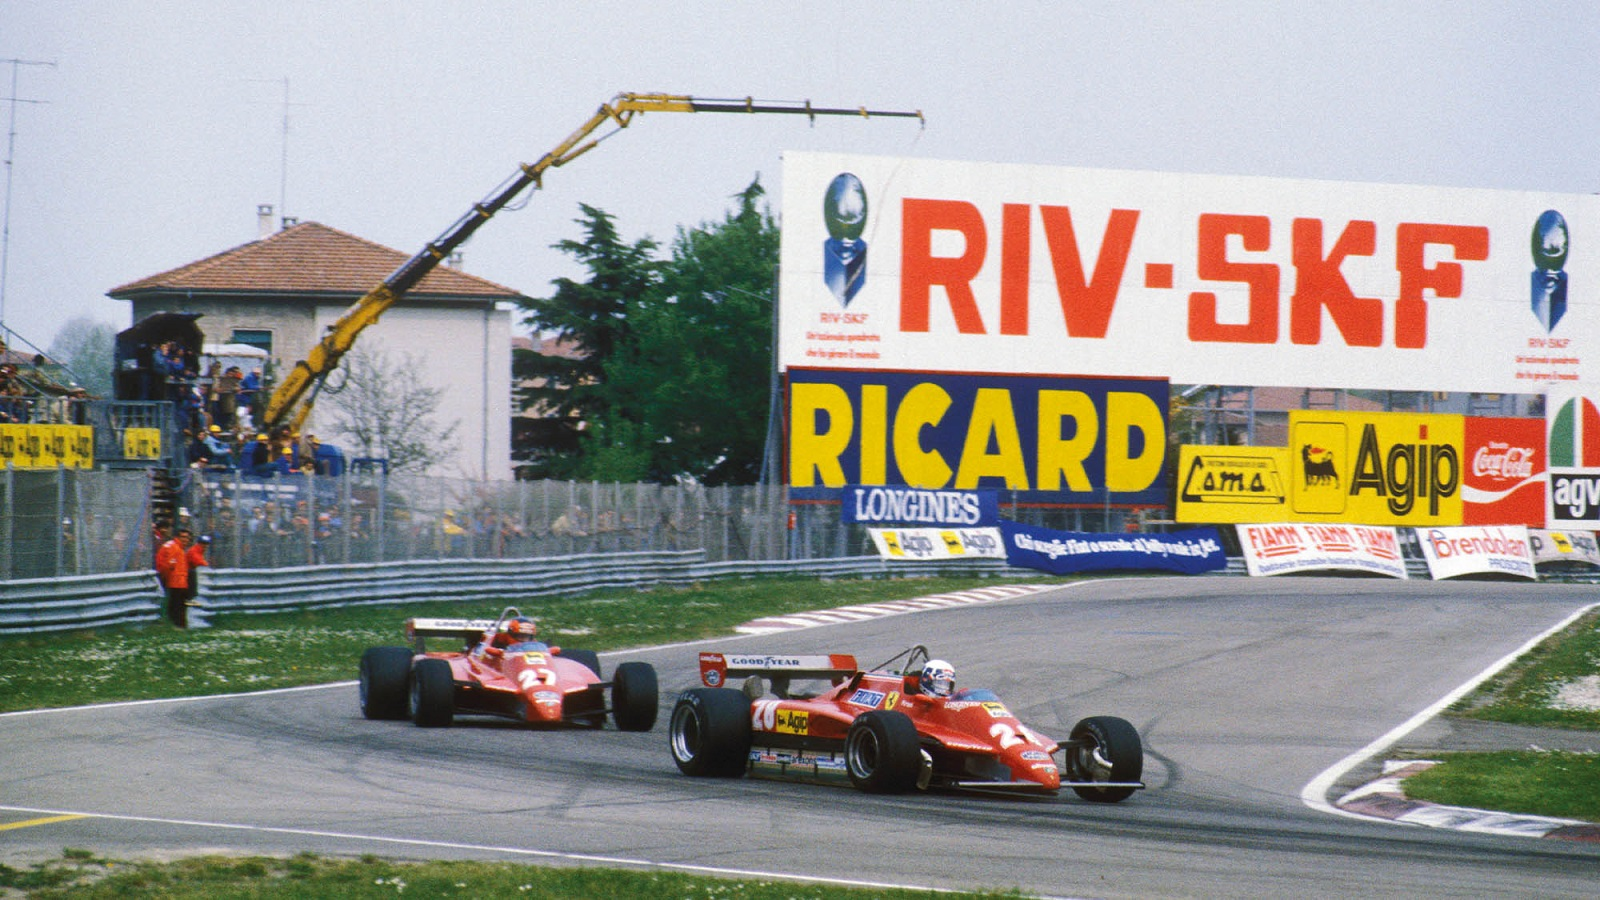 Didier-Pironi-and-GIlles-Villeneuve-at-Imola